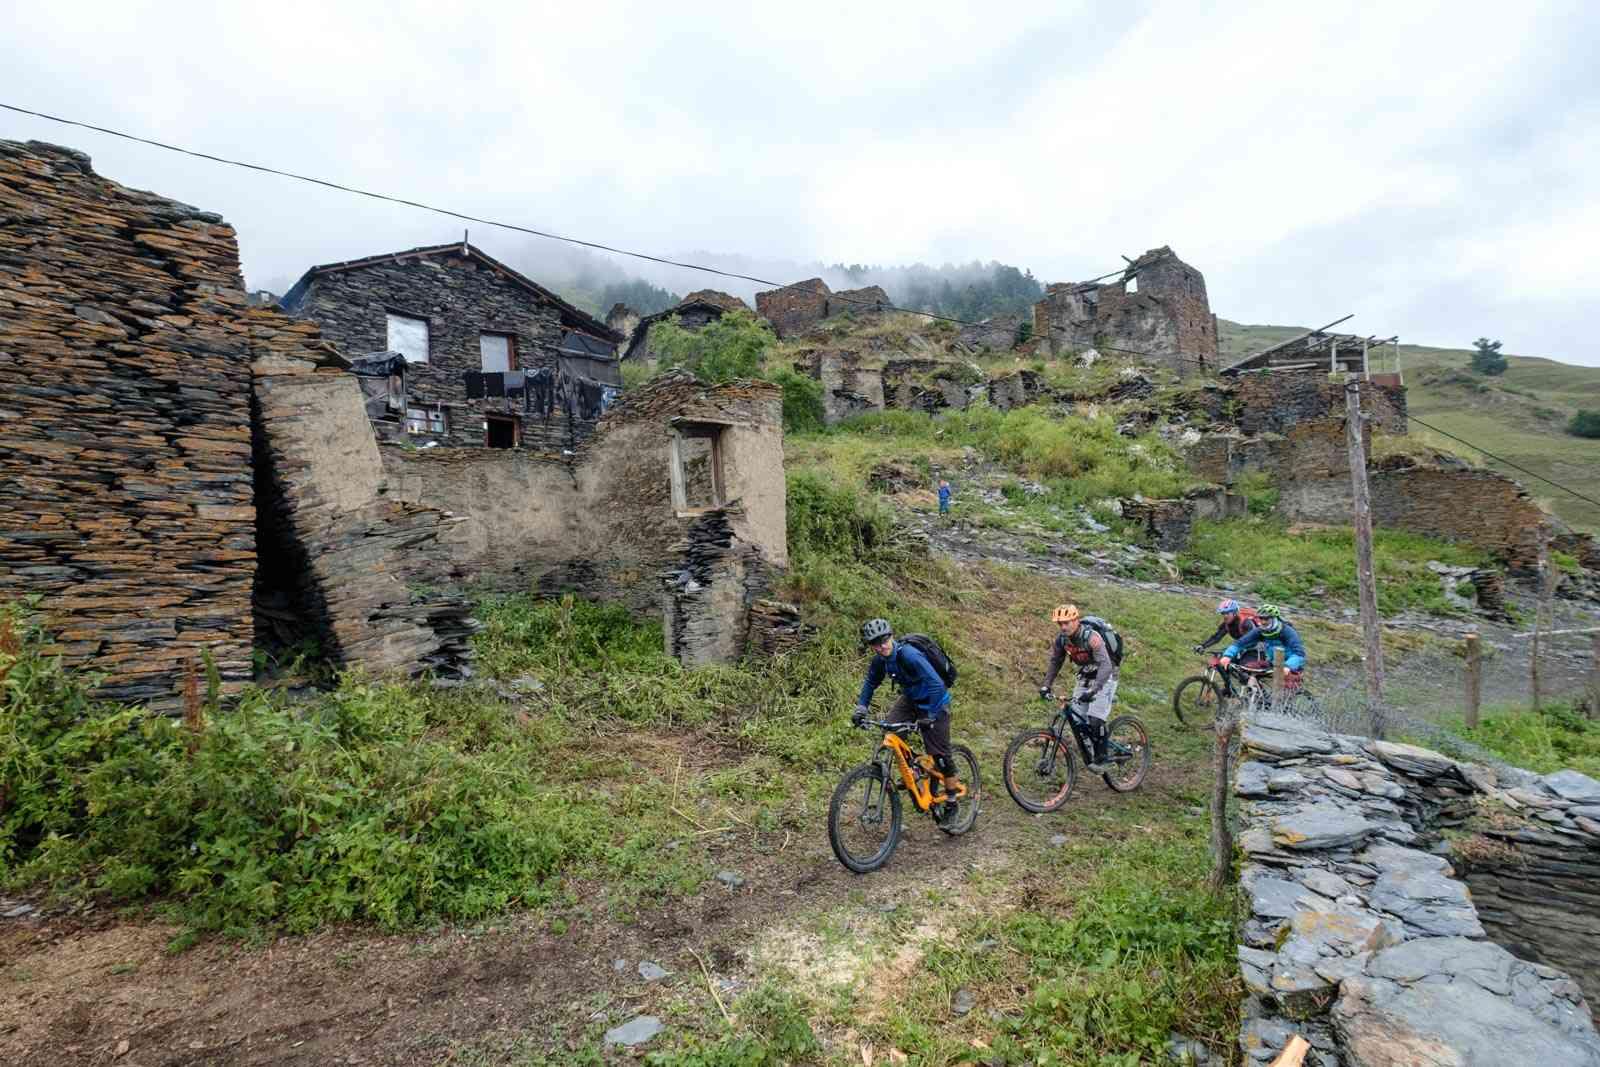 Alte verfallene Dörfer in Georgien